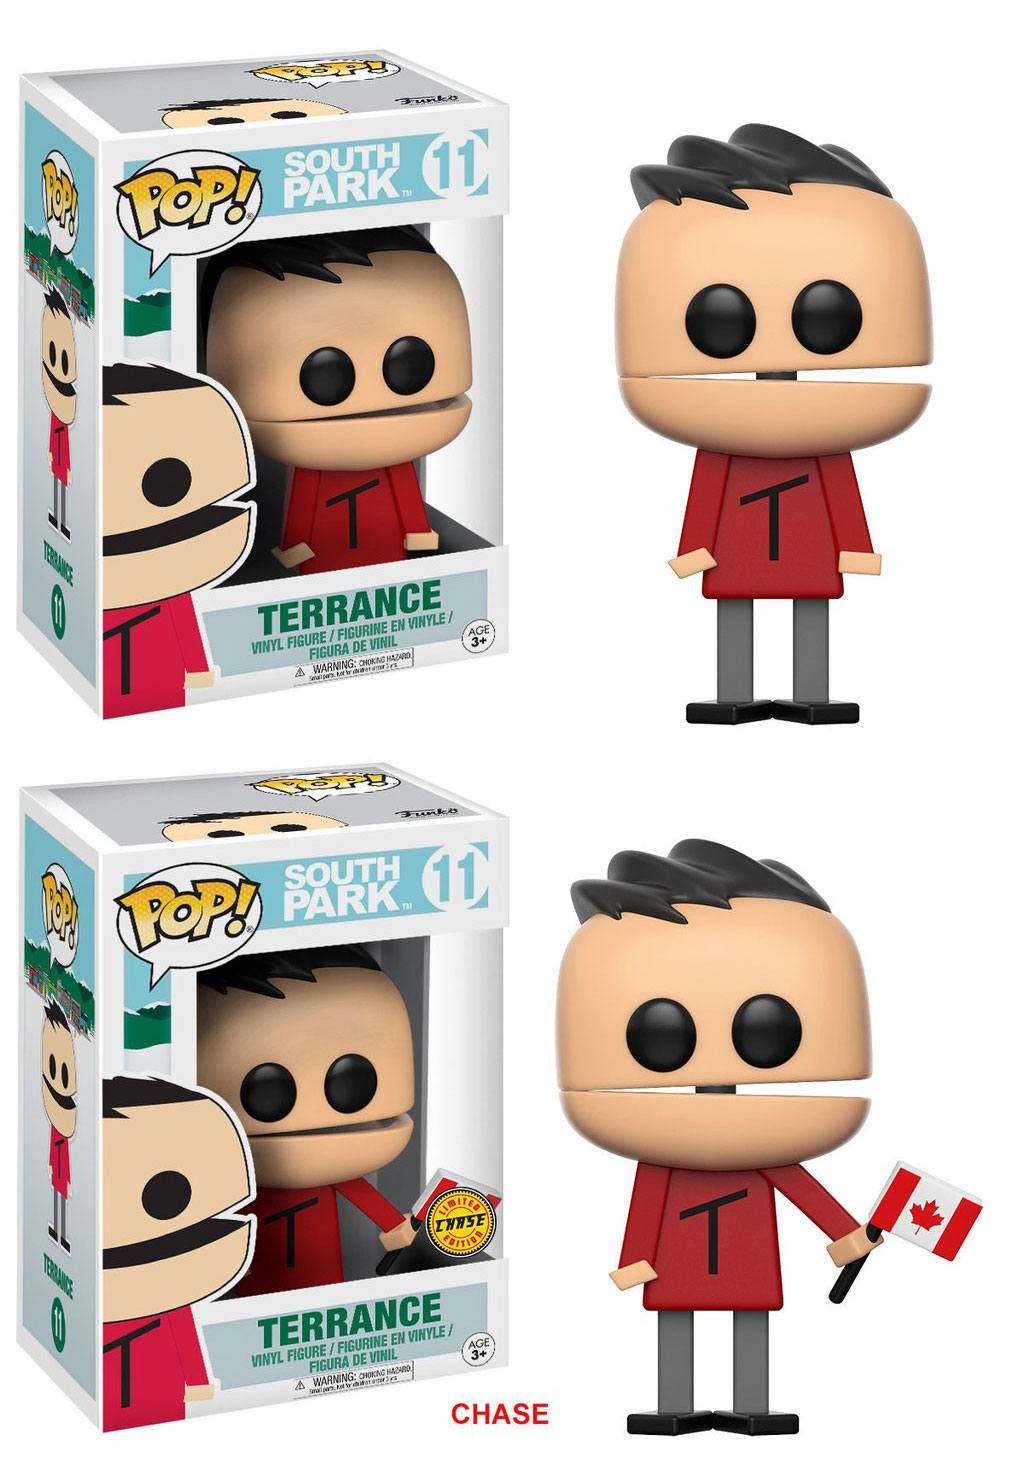 South Park POP! TV Vinyl Figures Terrence 9 cm Assortment (6)